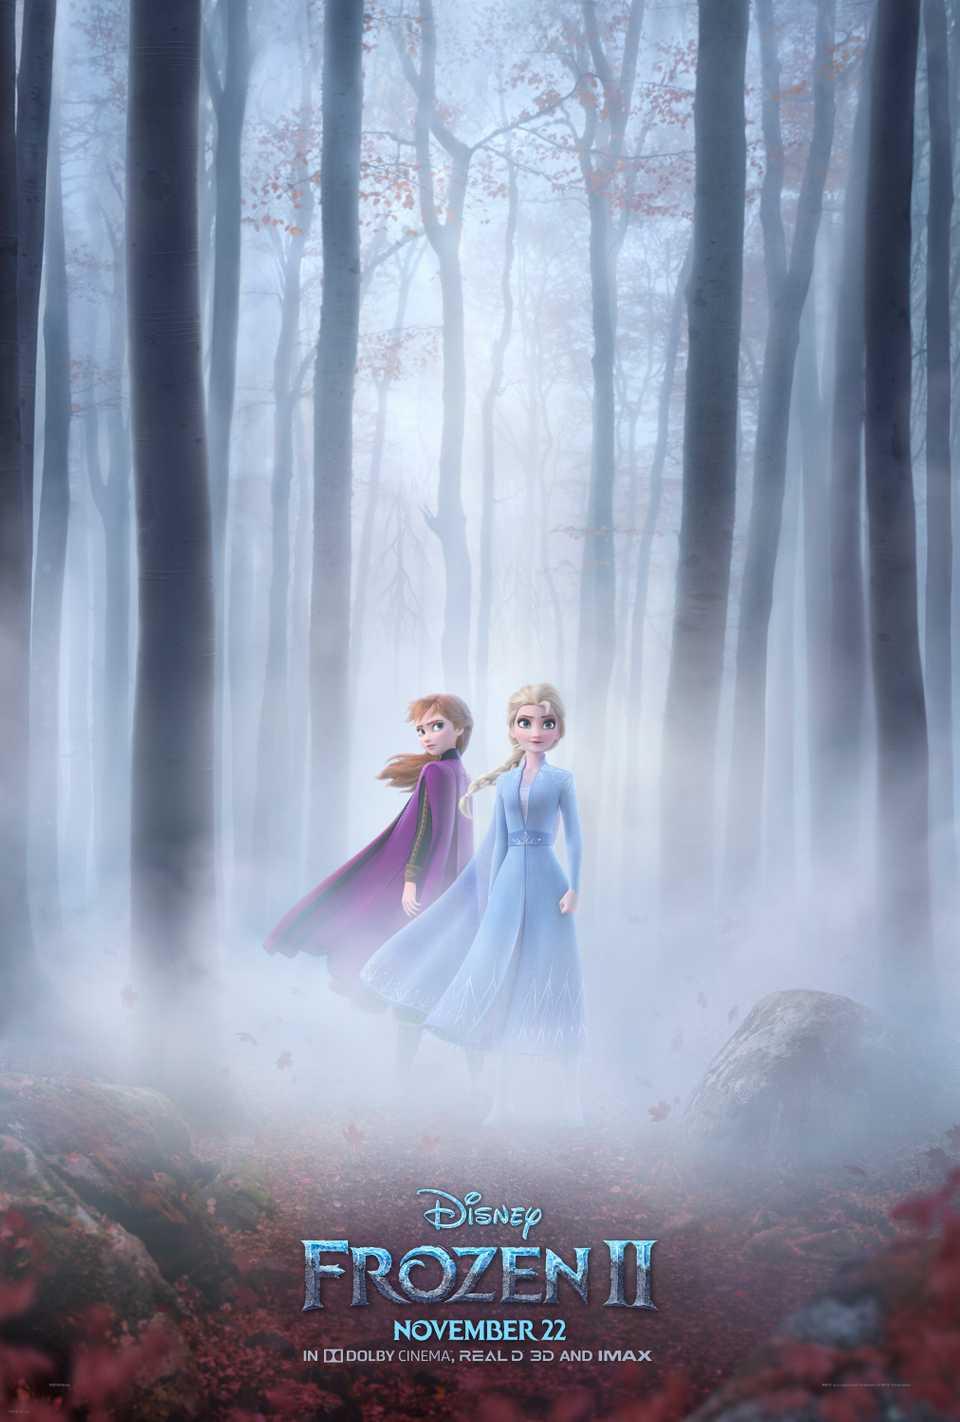 'Frozen 2' was released in theaters on Nov. 22.